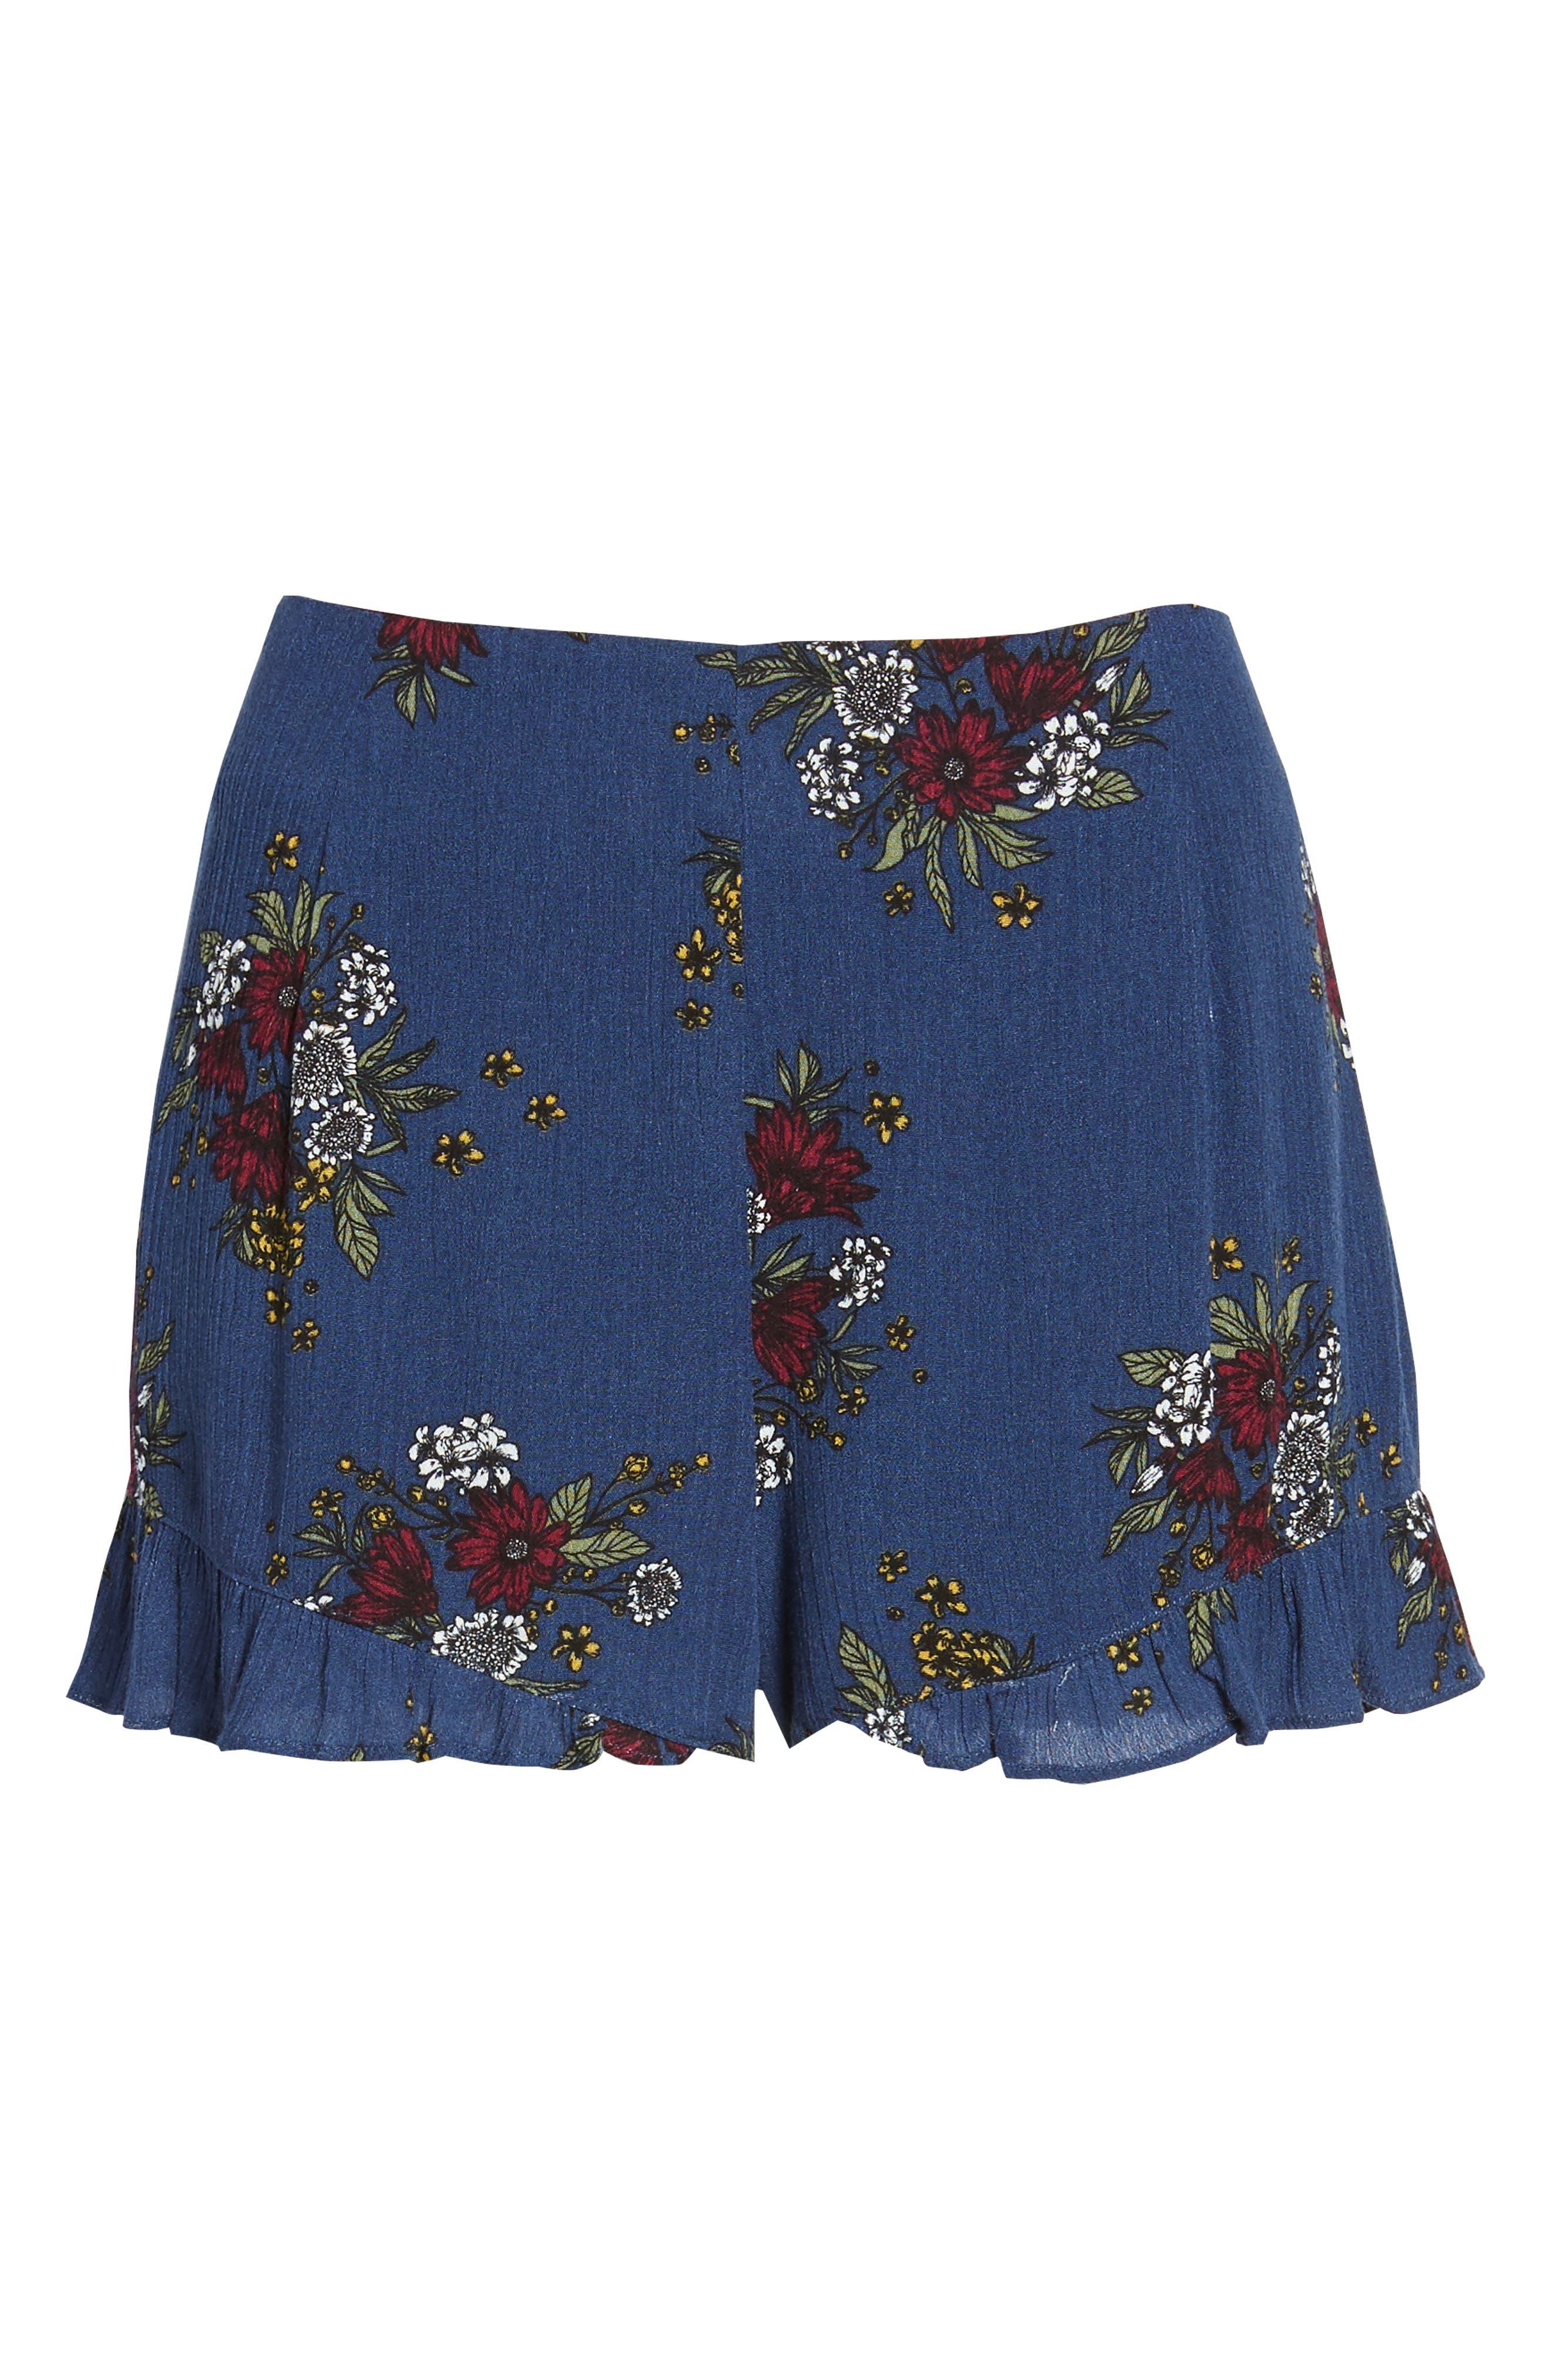 Theia Floral Ruffle Hem Shorts,                             Alternate thumbnail 6, color,                             402